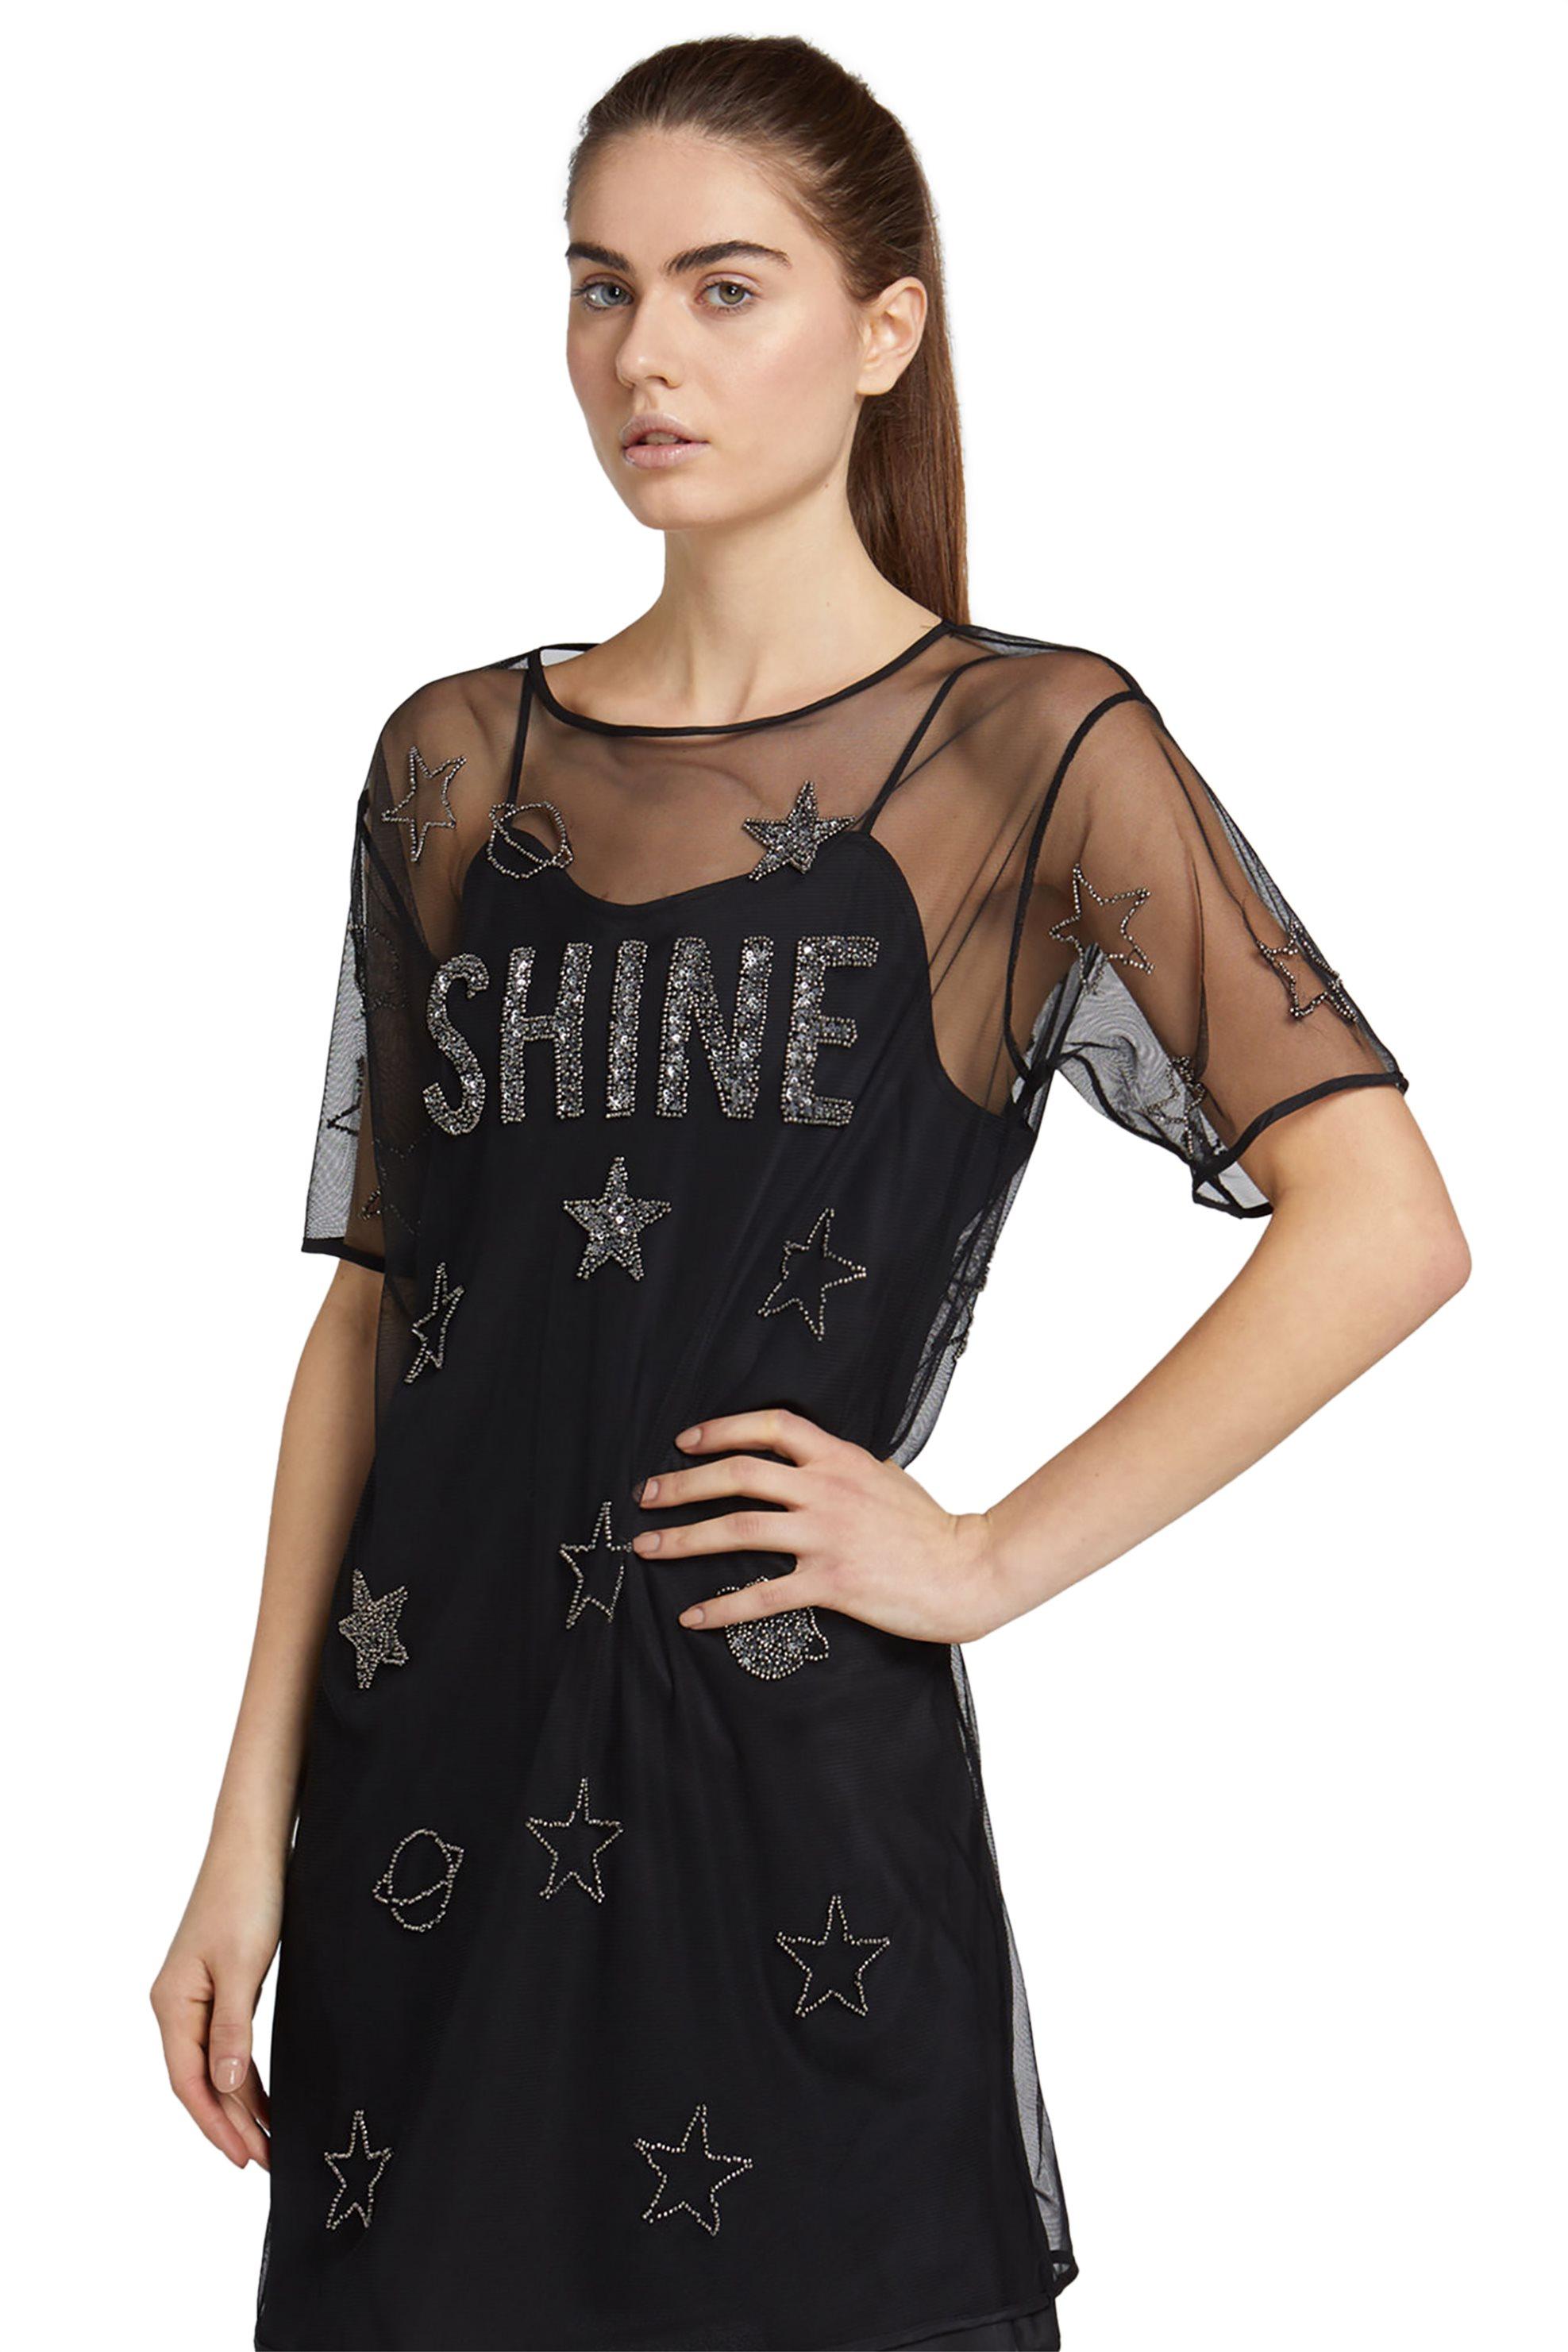 Trussardi Jeans γυναικείο μίνι φόρεμα με διαφάνεια και κέντημα - 56D00209-1T0015 γυναικα   ρουχα   φορέματα   mini φορέματα